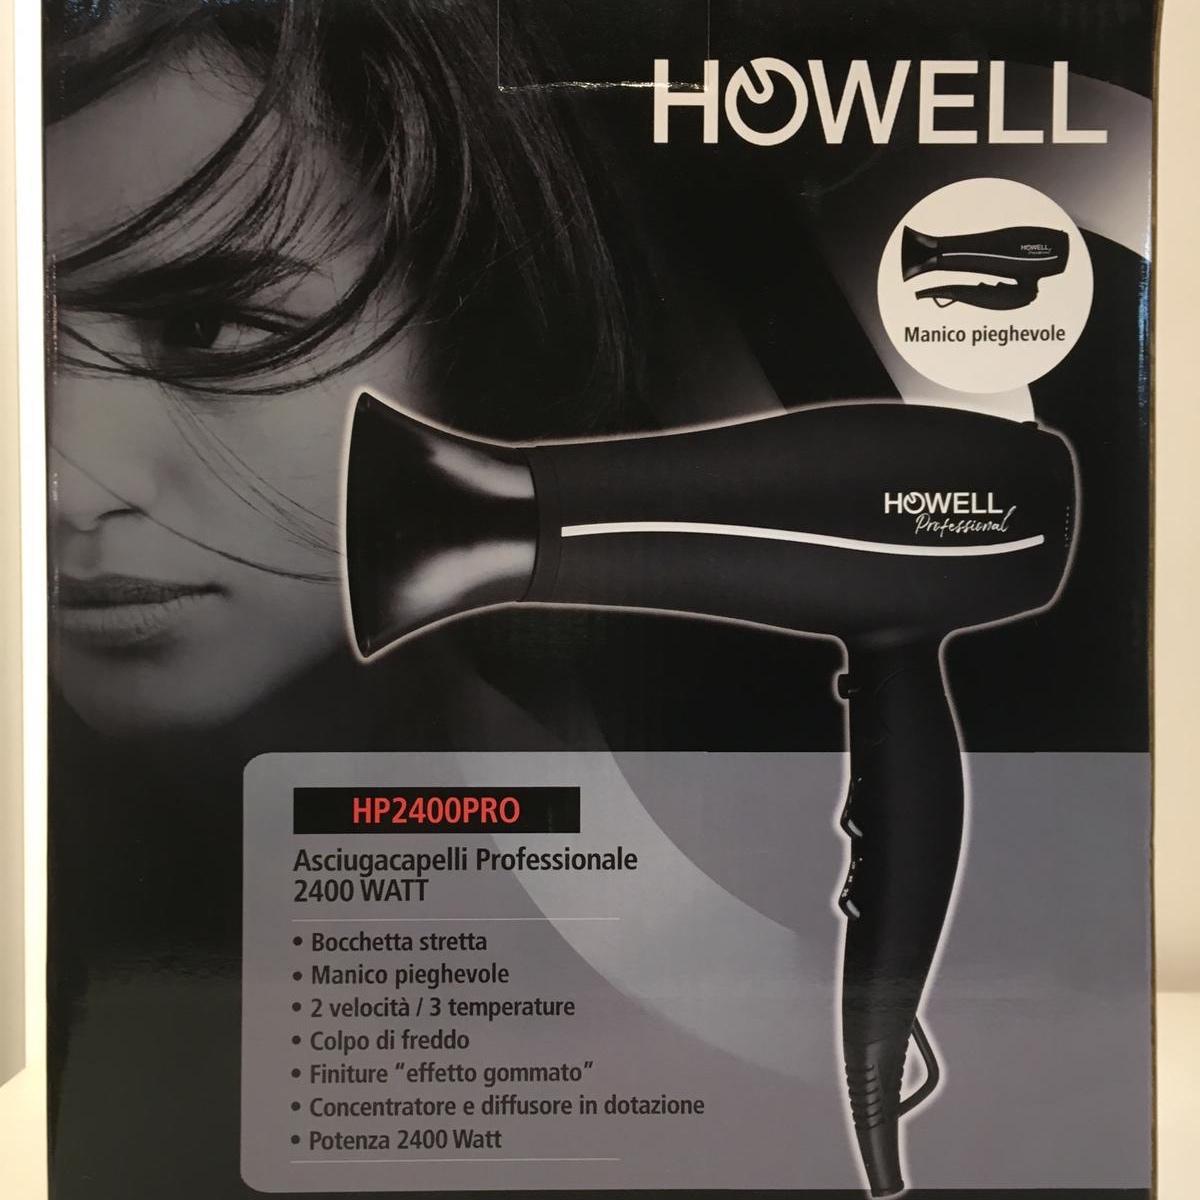 Asciugacapelli professionale Howell